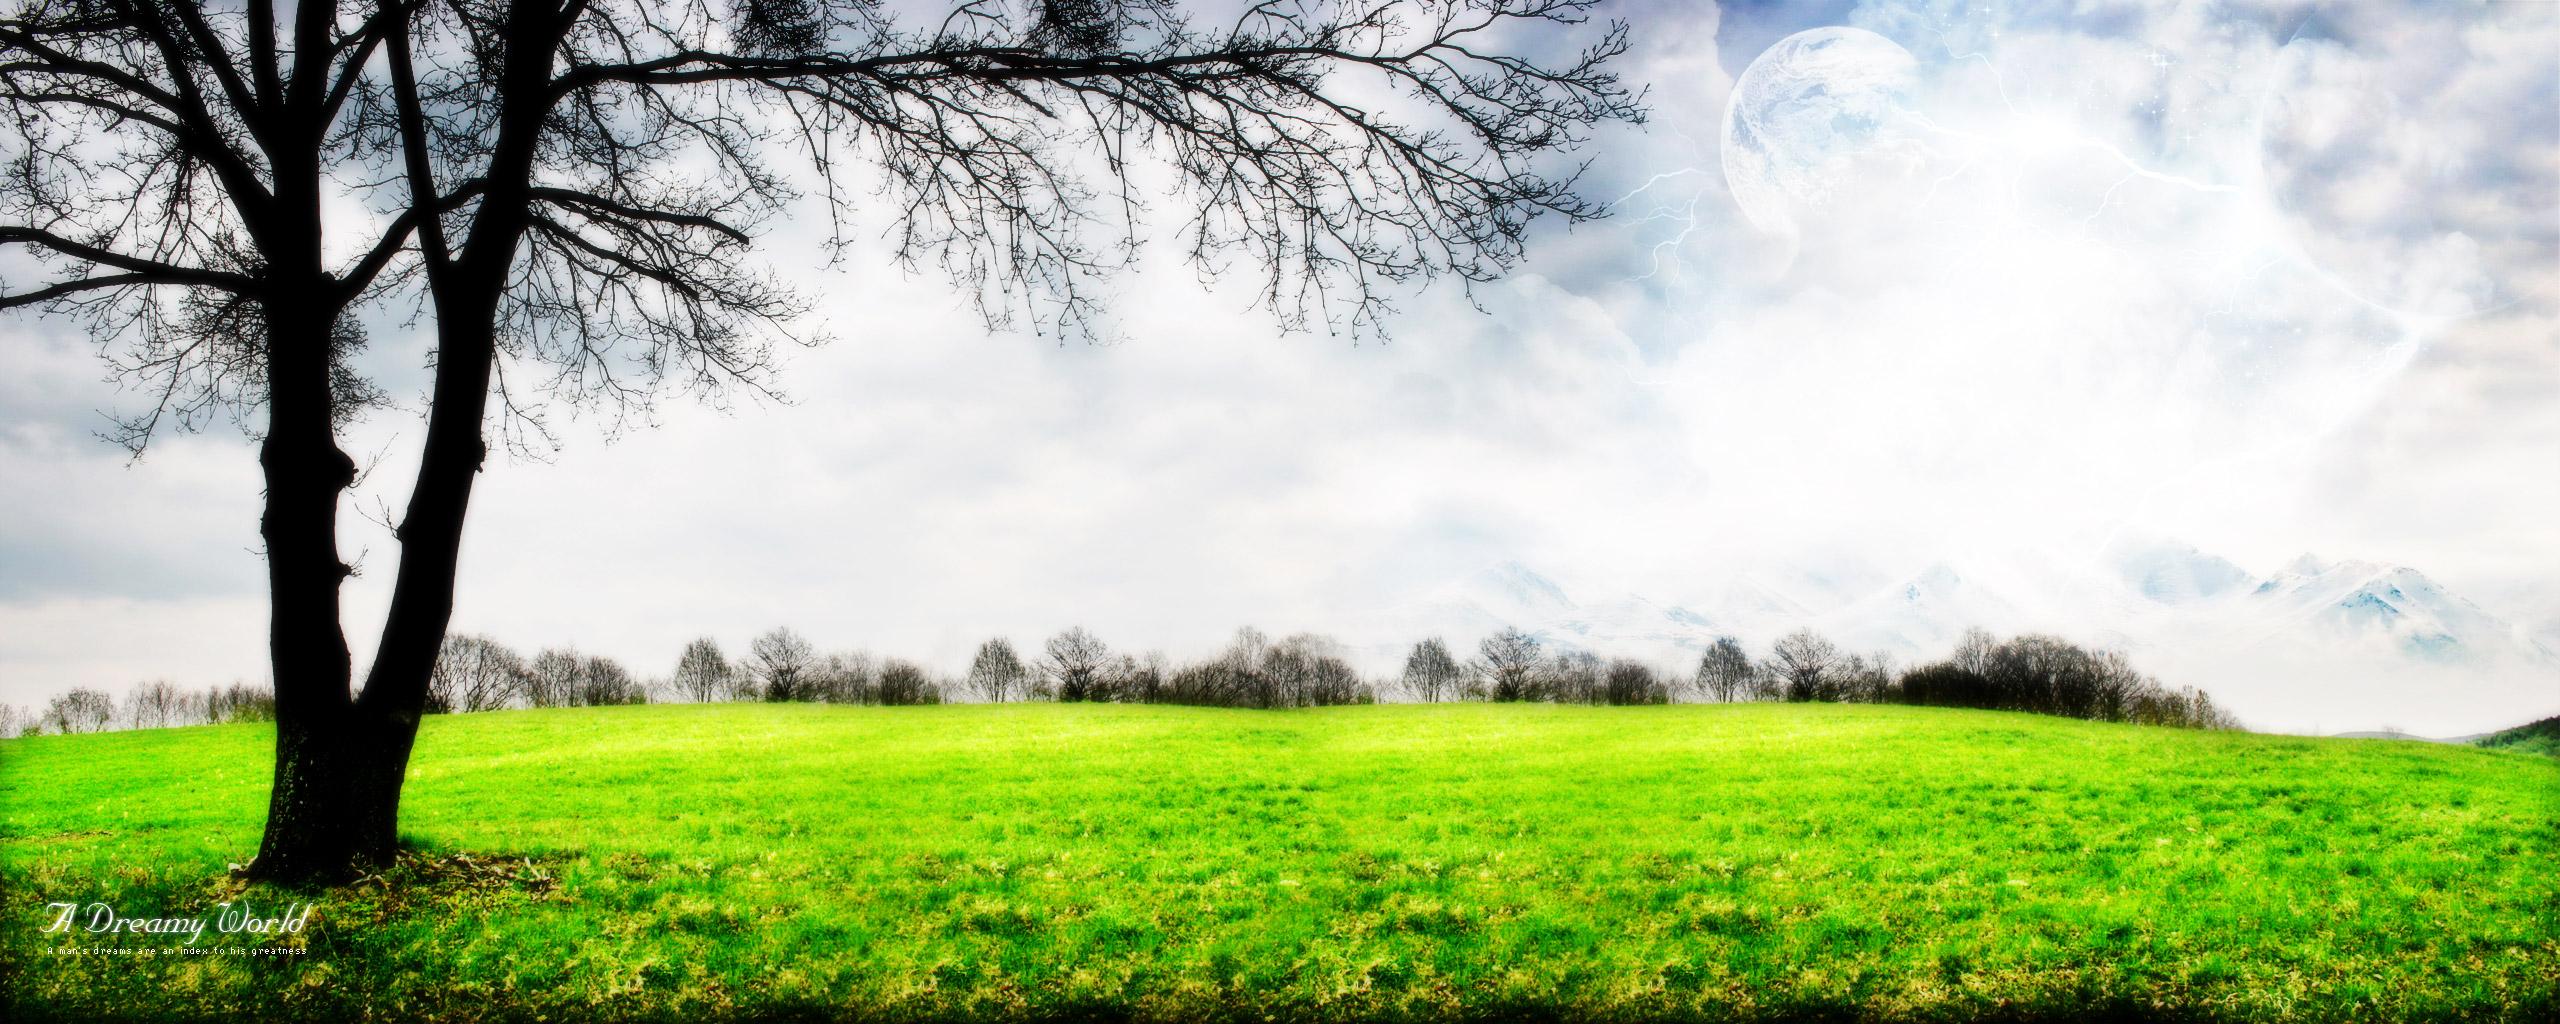 on A Grey Sky Wallpaper Green grass on A Grey Sky iPhone Wallpaper 2560x1024